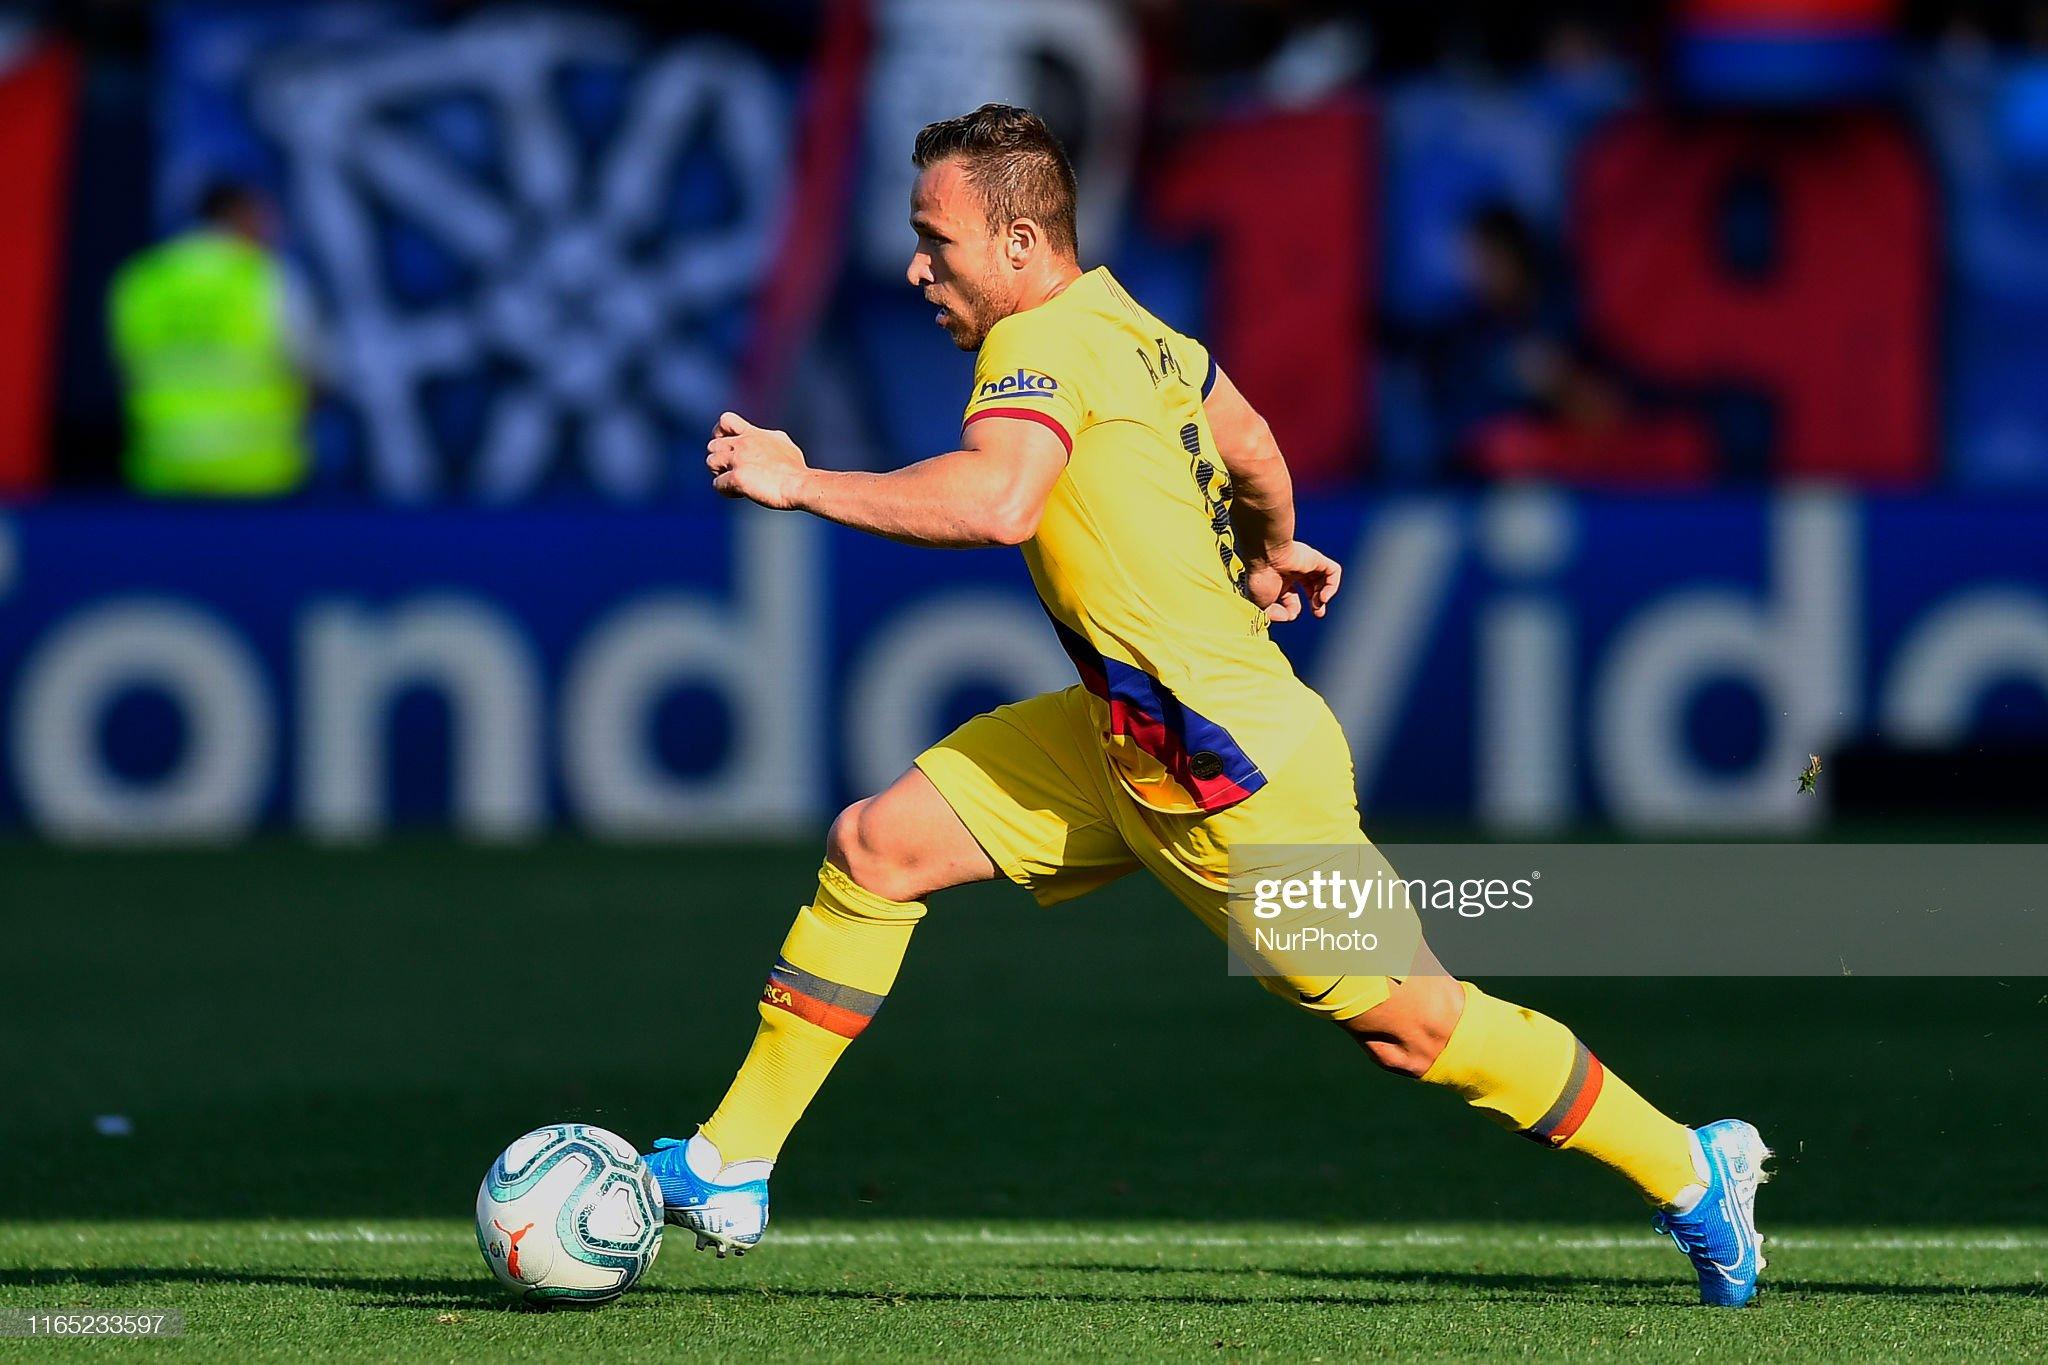 صور مباراة : أوساسونا - برشلونة 2-2 ( 31-08-2019 )  Arthur-melo-of-barcelona-in-action-during-the-liga-match-between-ca-picture-id1165233597?s=2048x2048